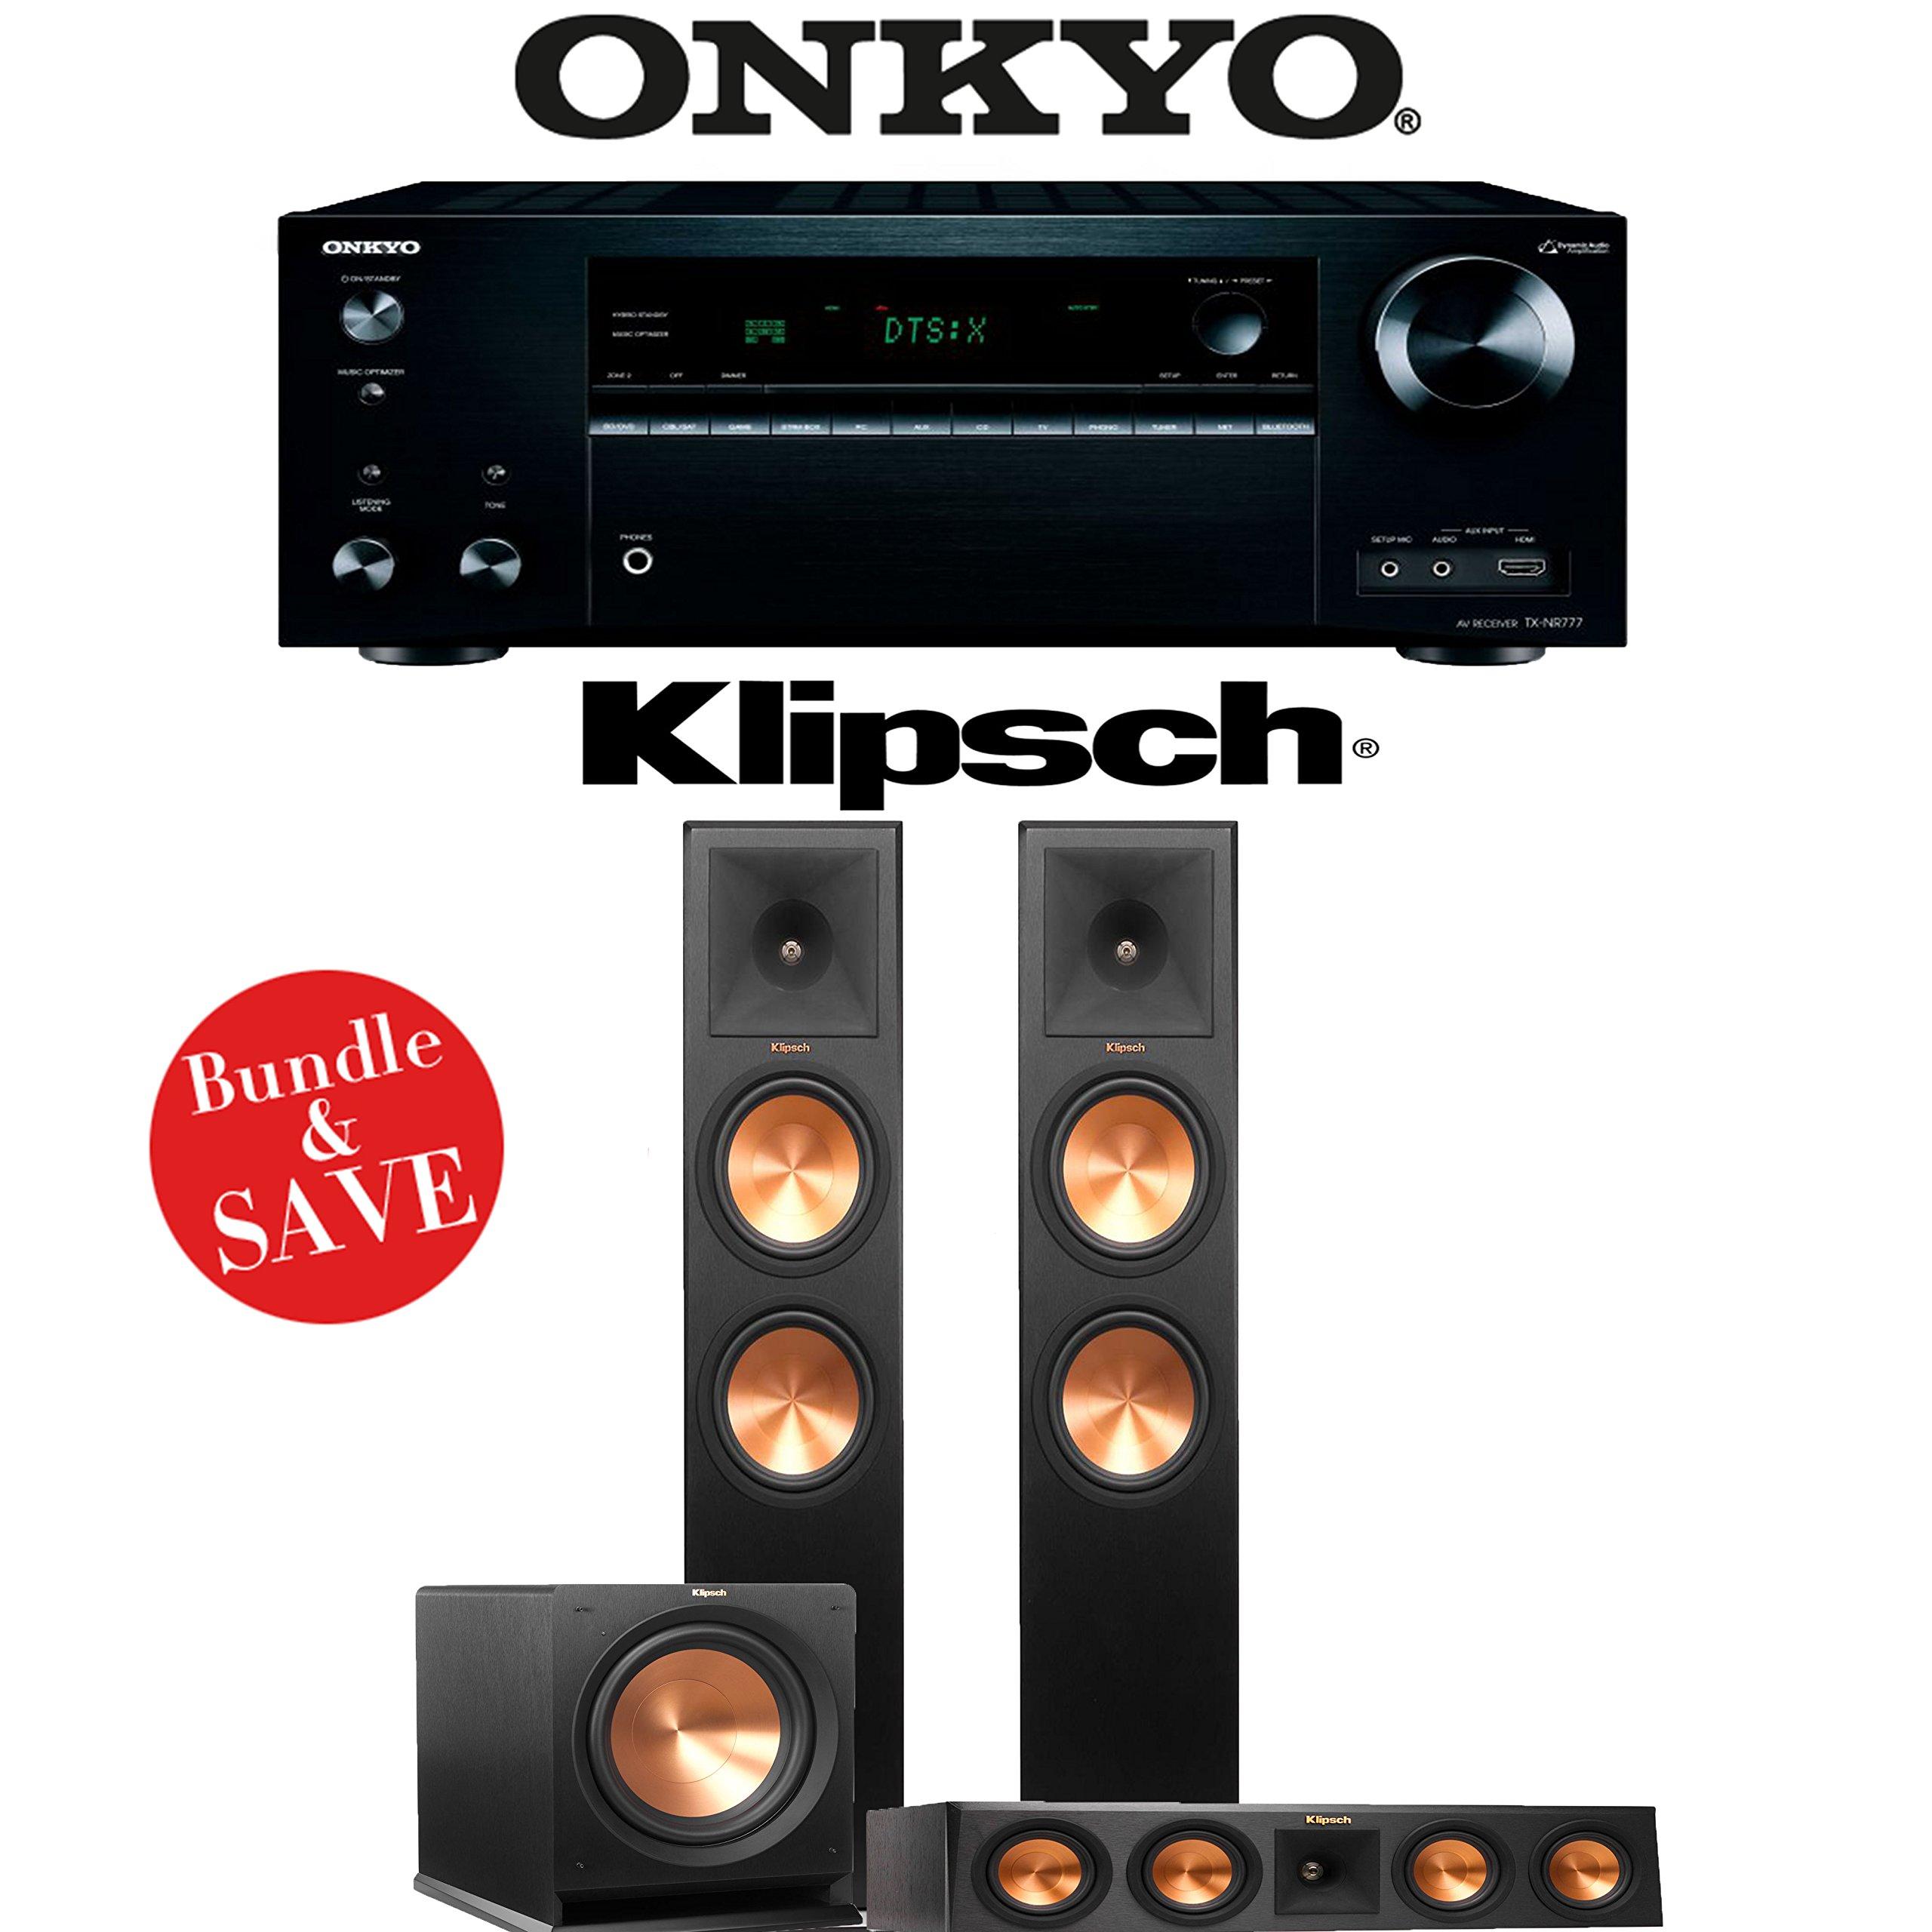 Onkyo TX-NR777 7.2-Channel 4K THX Certified Network A/V Receiver + Klipsch RP-280F + Klipsch RP-450C + Klipsch R-112SW - 3.1-Ch Home Theater Package by Klipsch